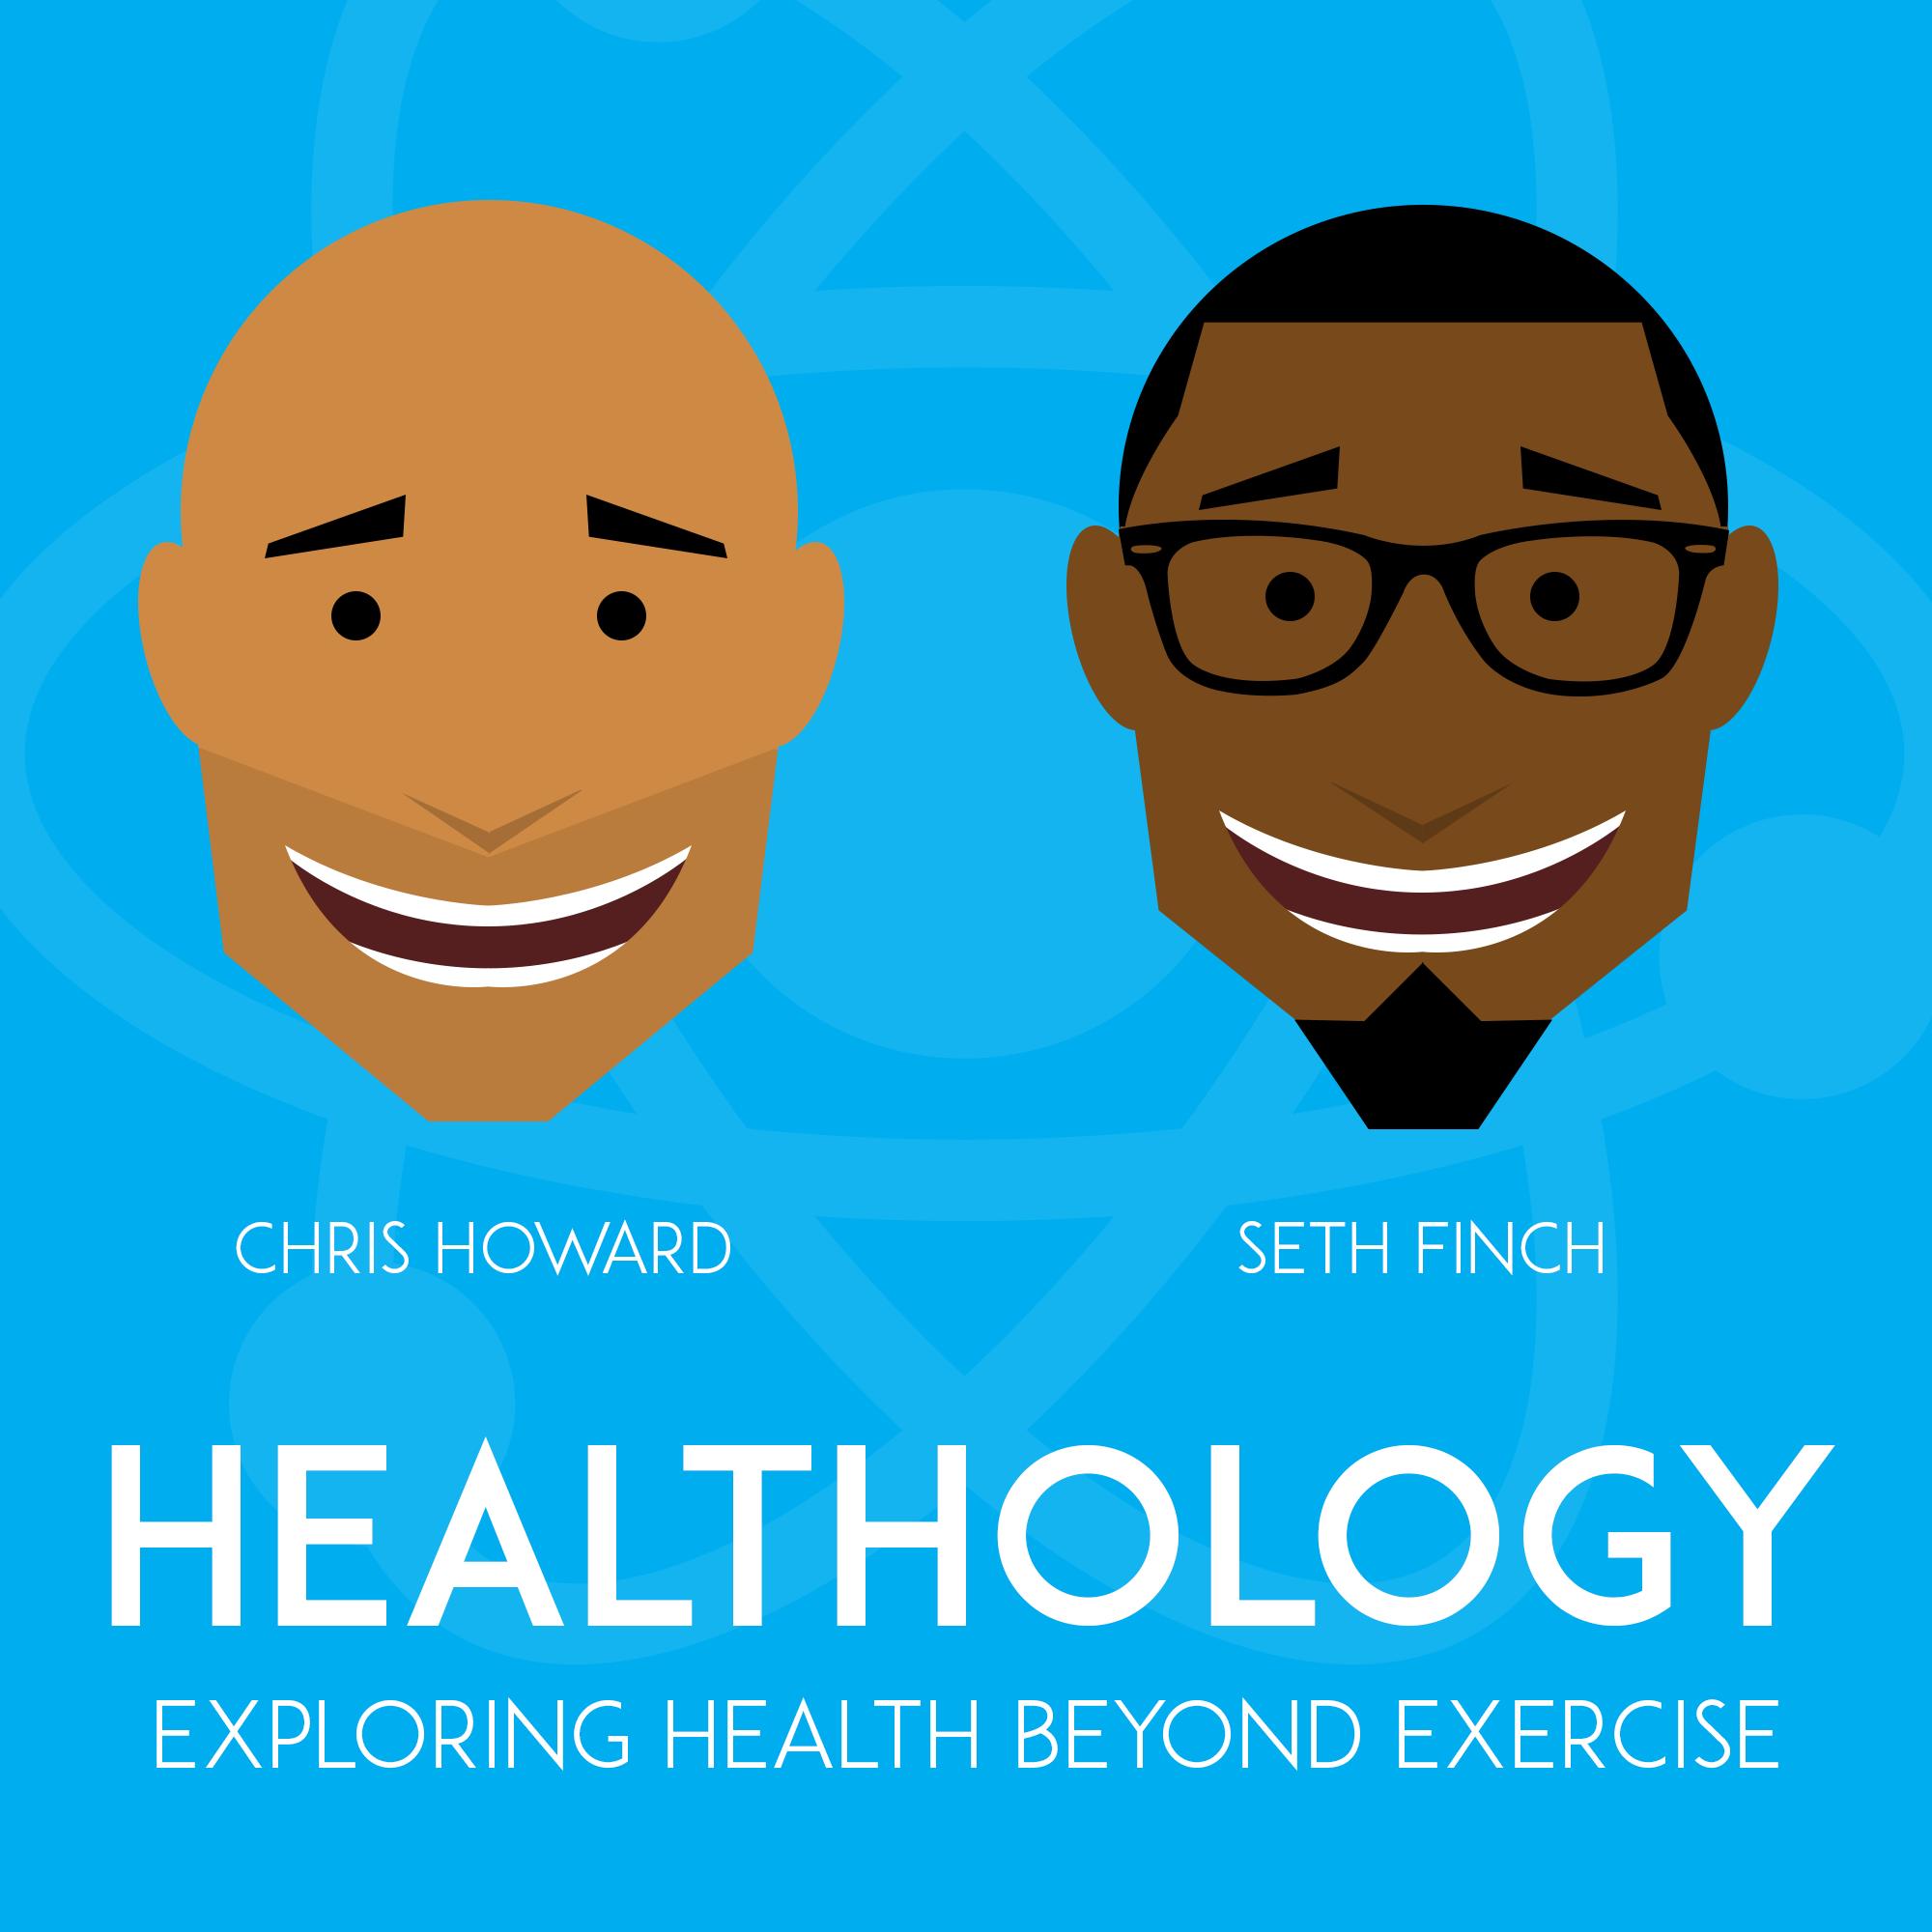 Healthology